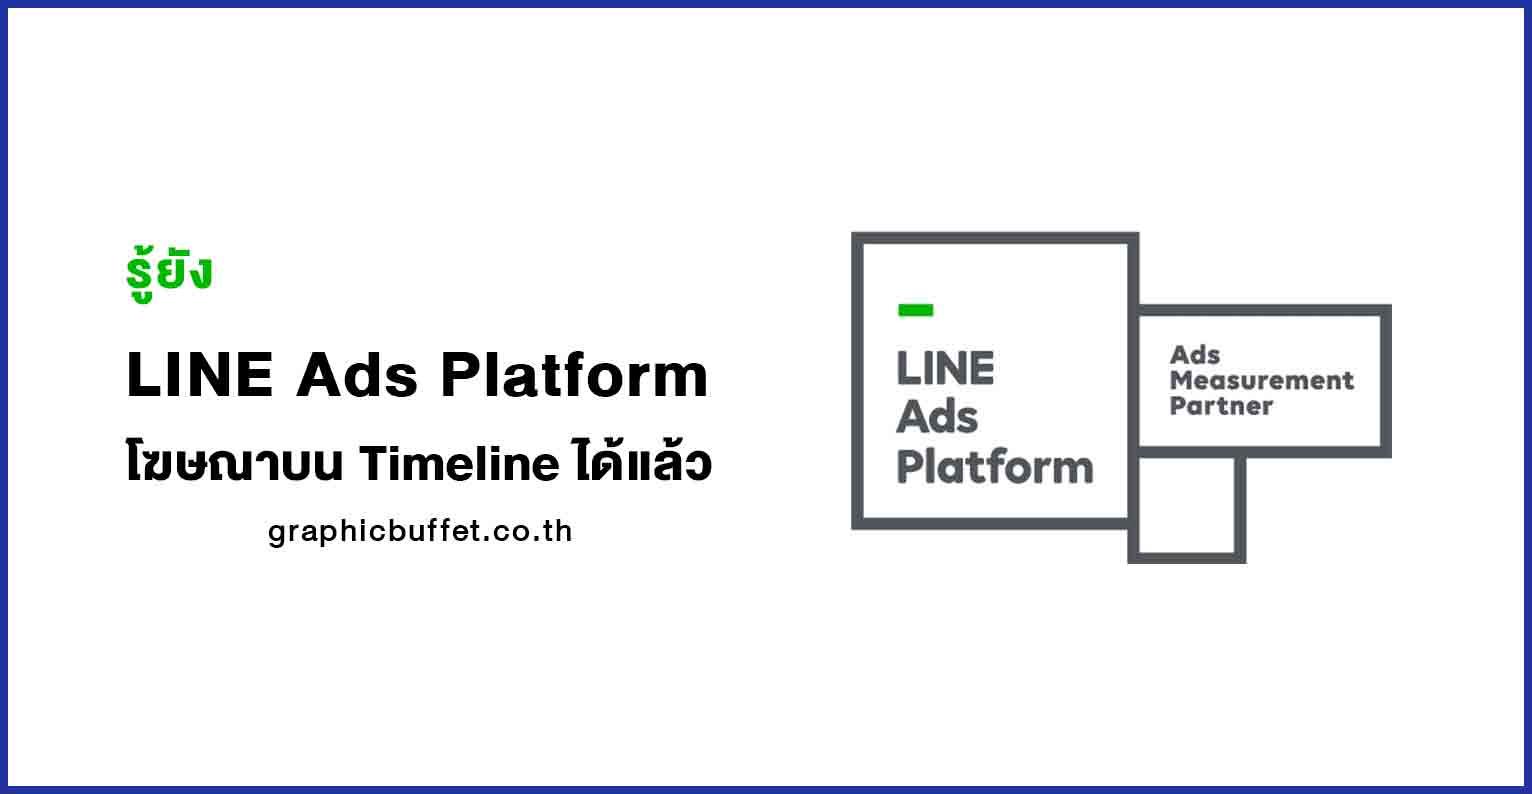 LINE ads platform LINE ads platform ซื้อโฆษณาผ่าน Line เพื่อโปรโมทบน Timeline ได้แล้ว